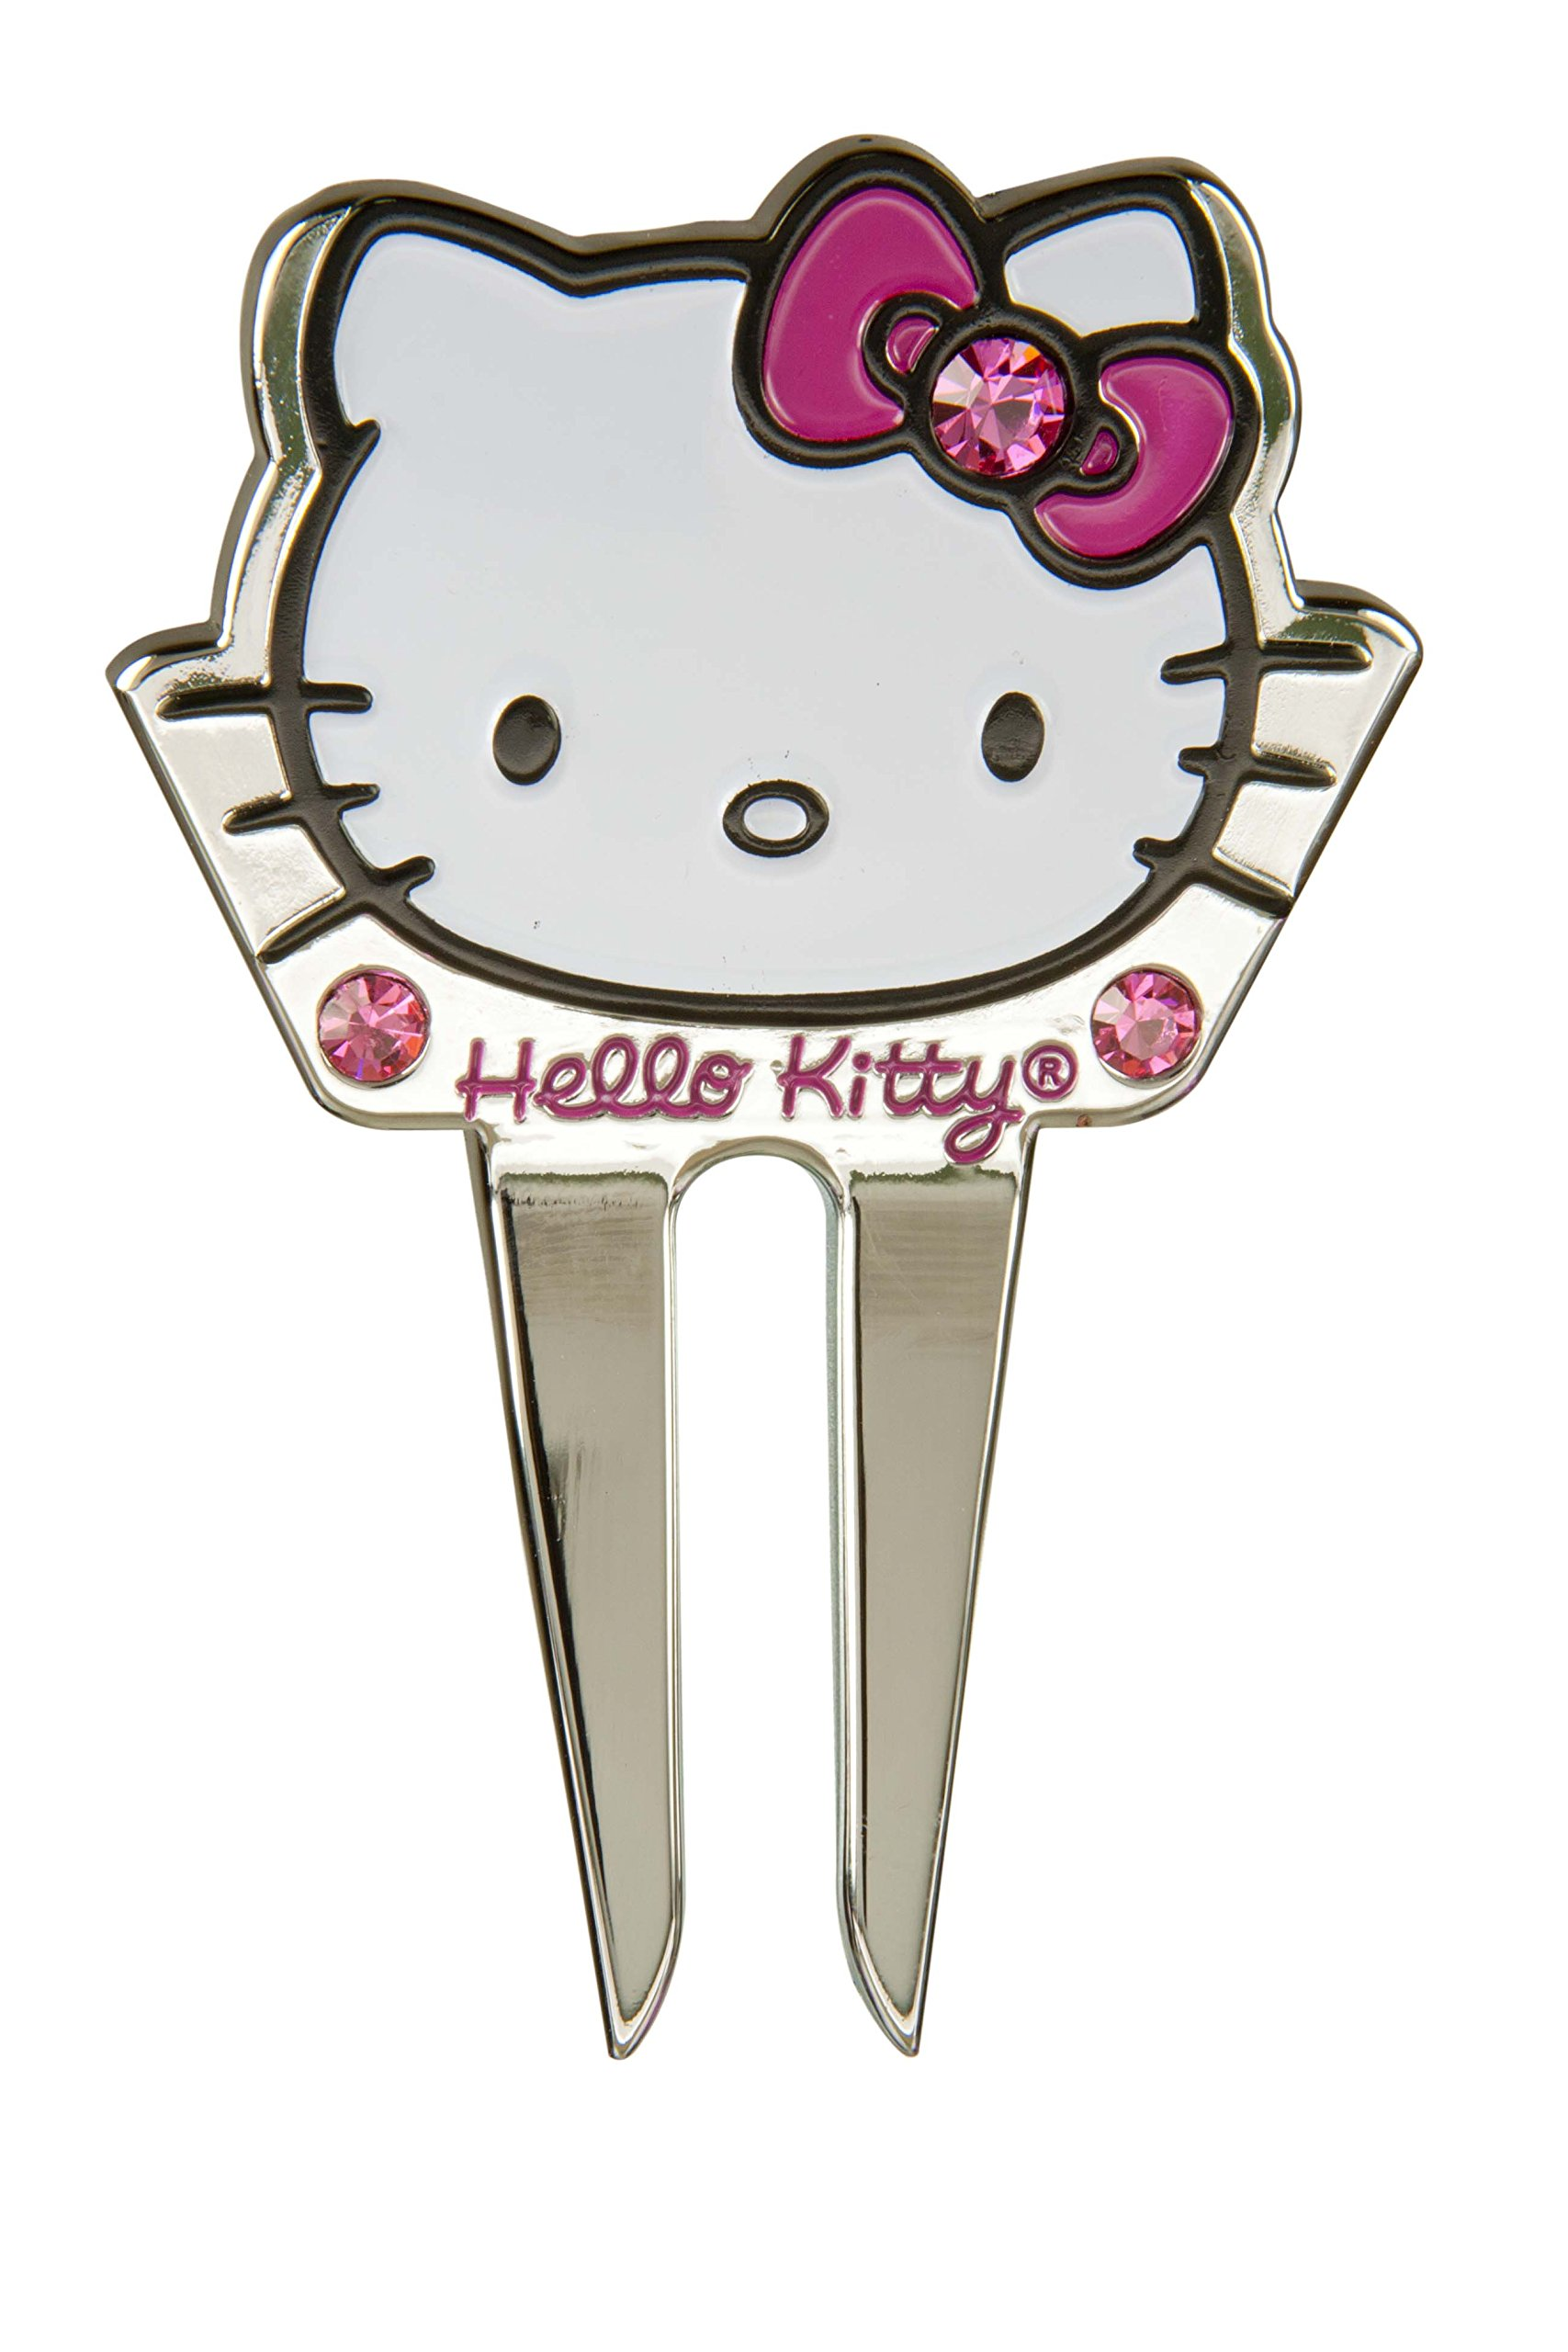 Hello Kitty Golf 3 Item - Kit -''The Collection'' Golf Balls (6 balls) + Hello Kitty Sports Script Hat (1 pc.) + Hello Kitty Premier Collection Divot Tool (1 pc.) by Hotshots (Image #5)